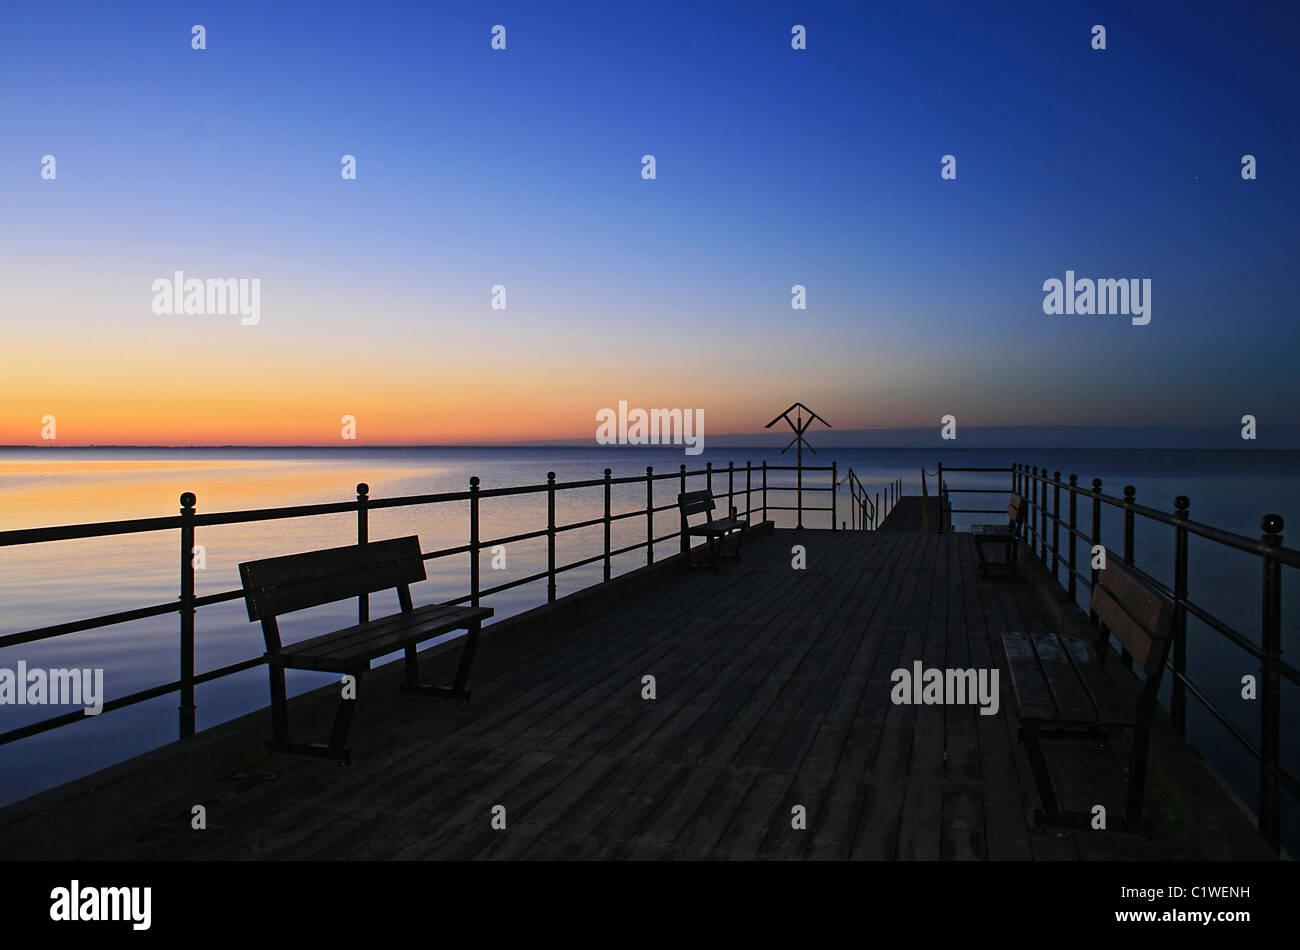 Lake Photo Stock